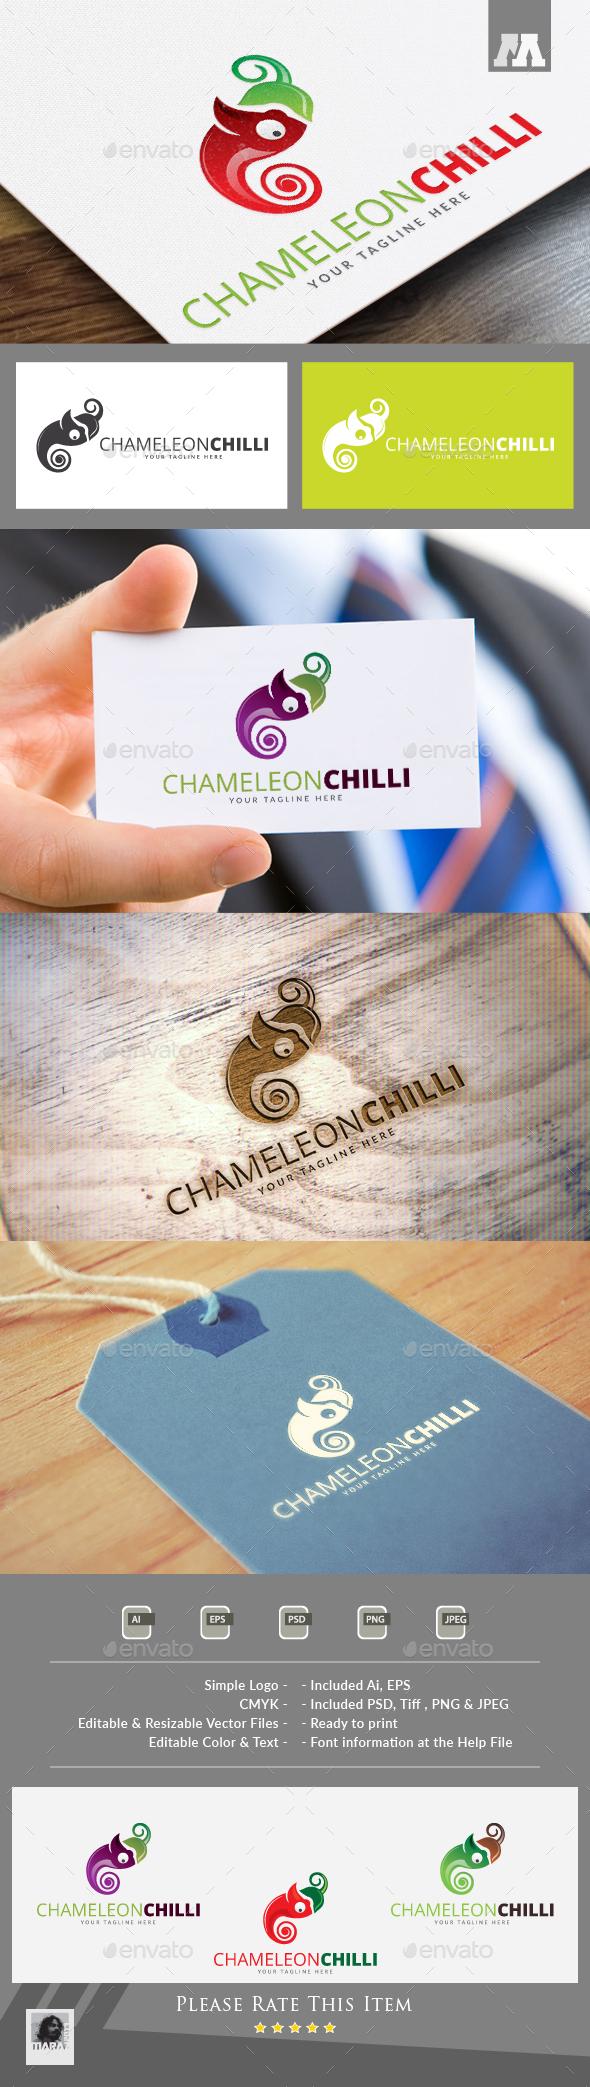 Chameleon Chili Logo - Food Logo Templates